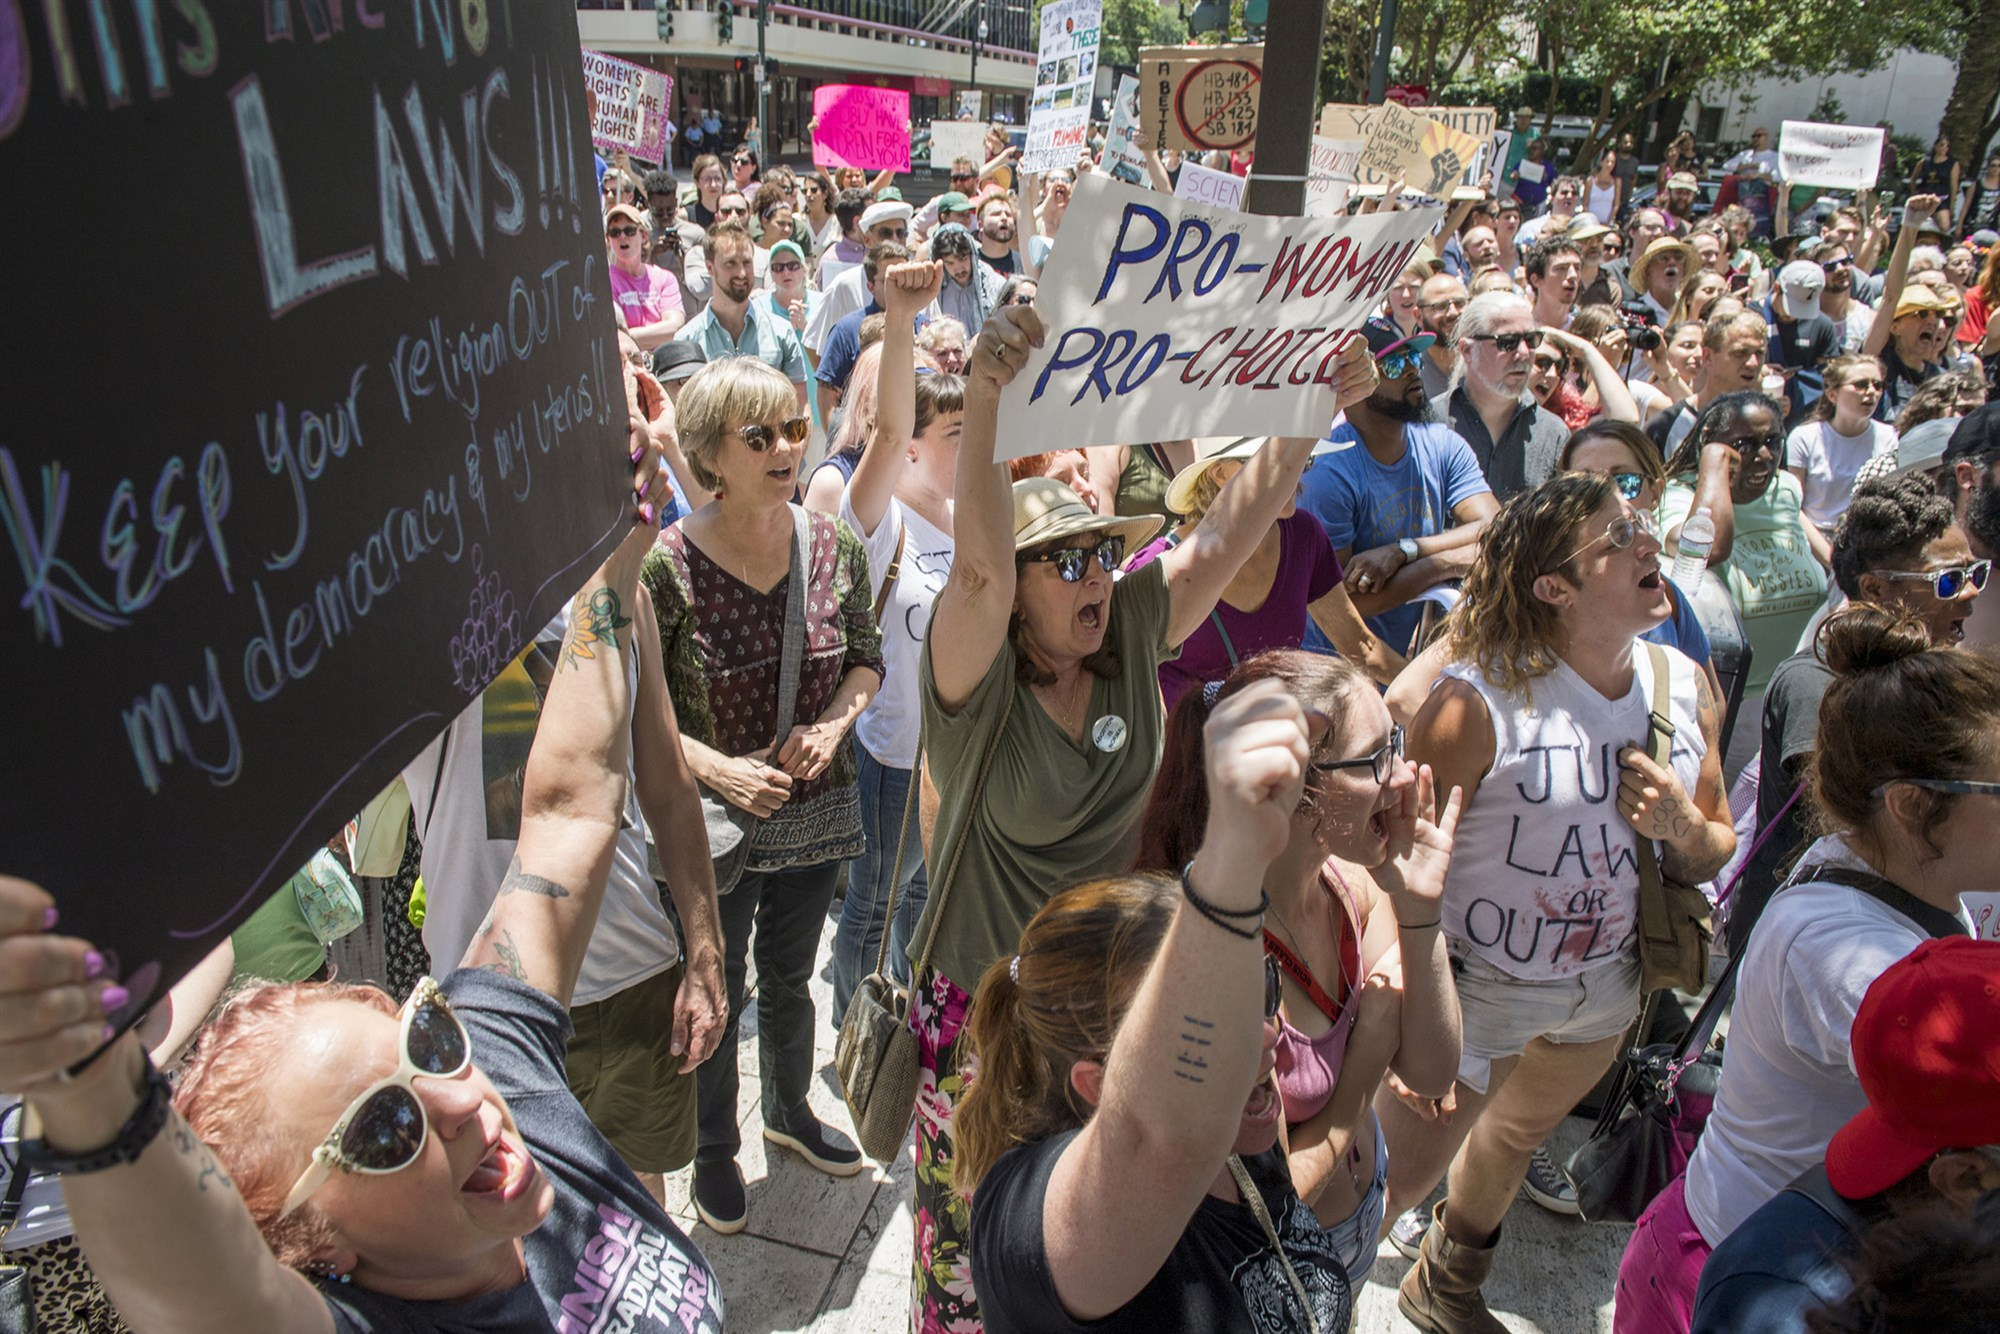 Louisiana Passes Controversial Abortion Bill